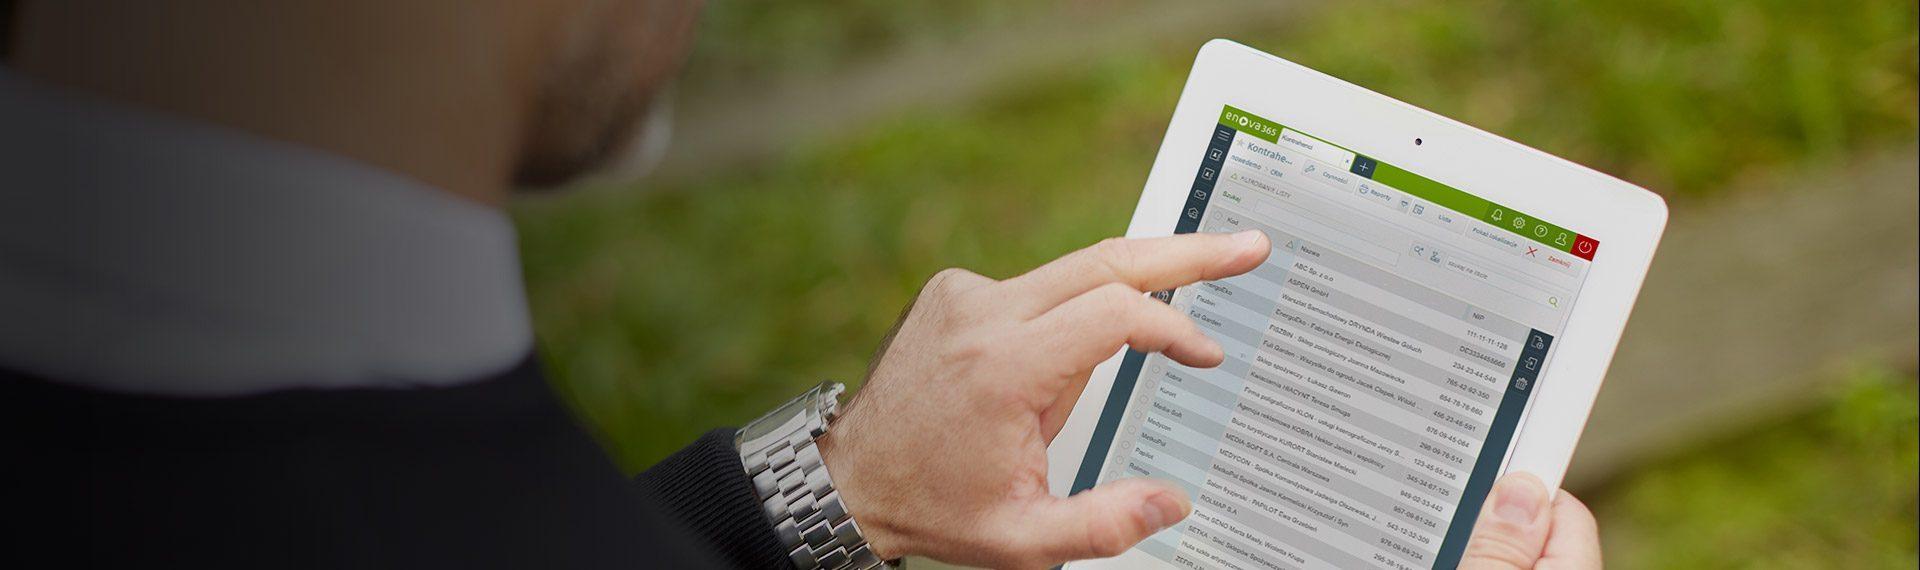 mężczyzna korzysta z tabletu z systemem ERP enova365